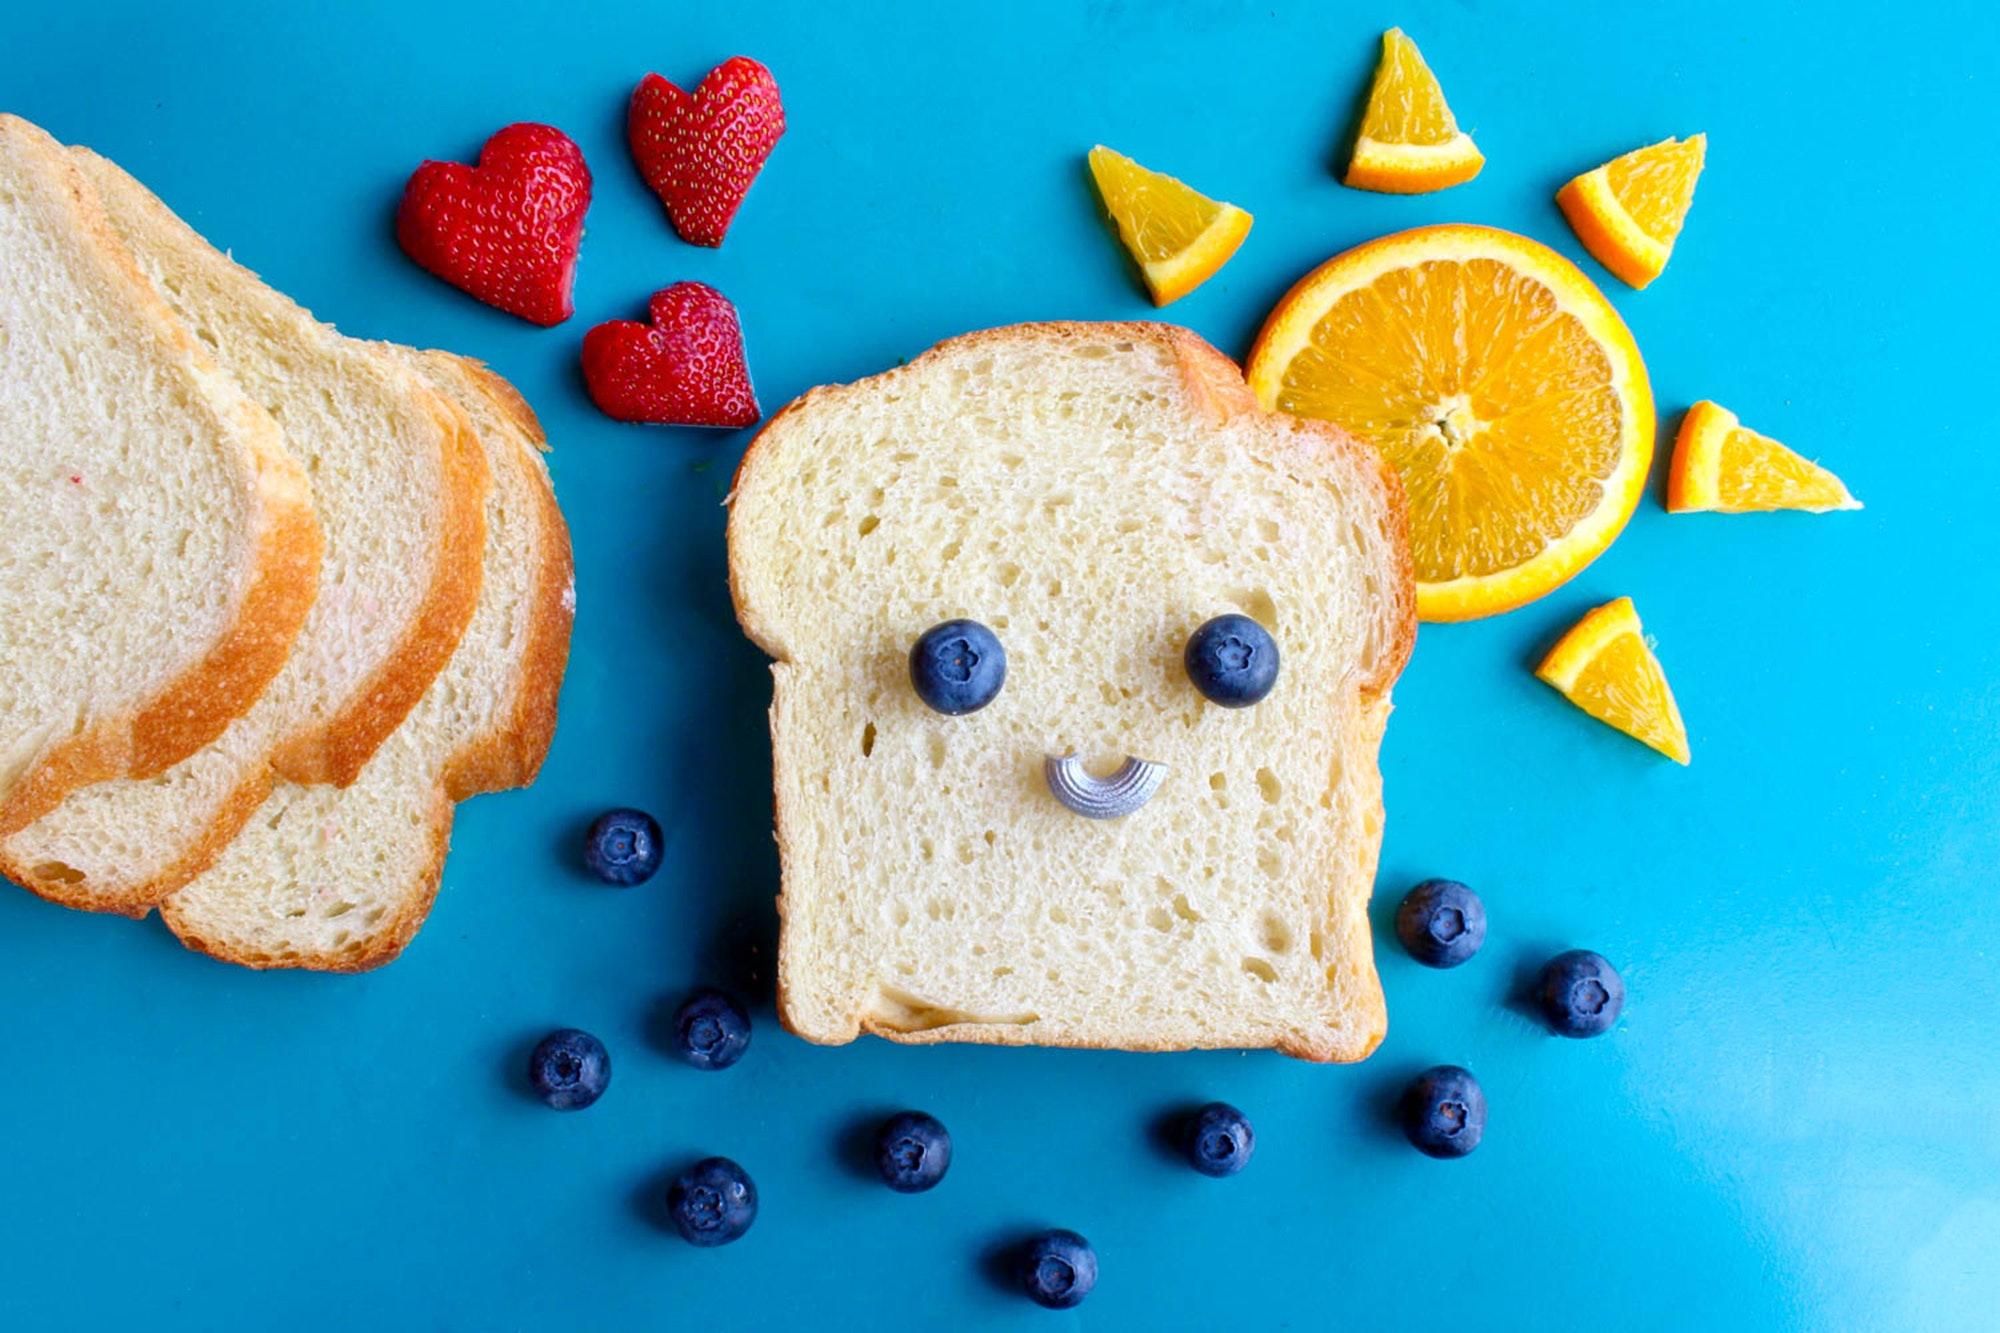 Kinder, Ernährung, Gesundes Essen